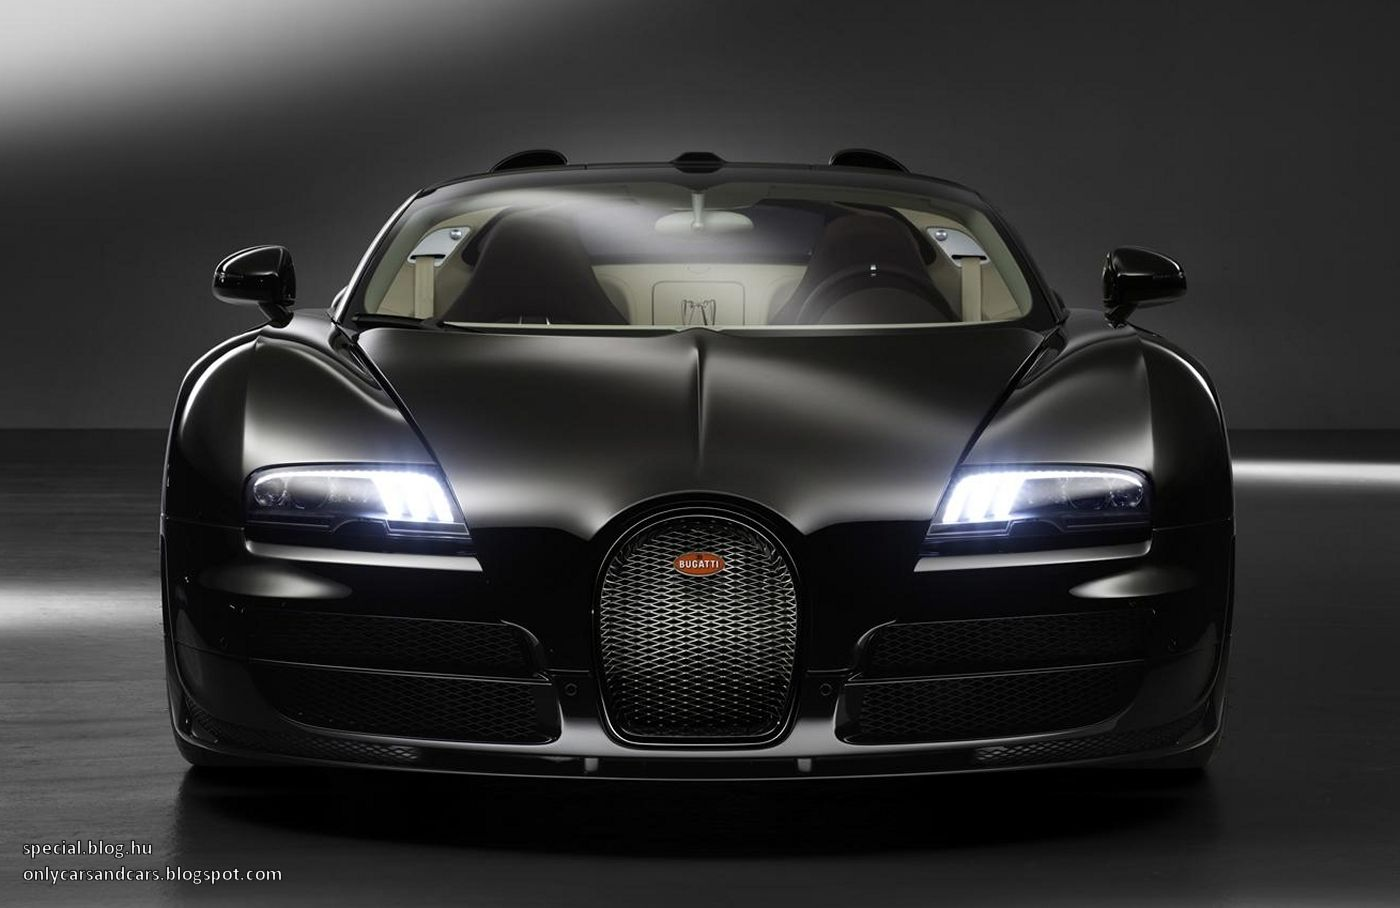 bugatti veyron 16 4 grand sport vitesse jean bugatti special edition only cars and cars. Black Bedroom Furniture Sets. Home Design Ideas